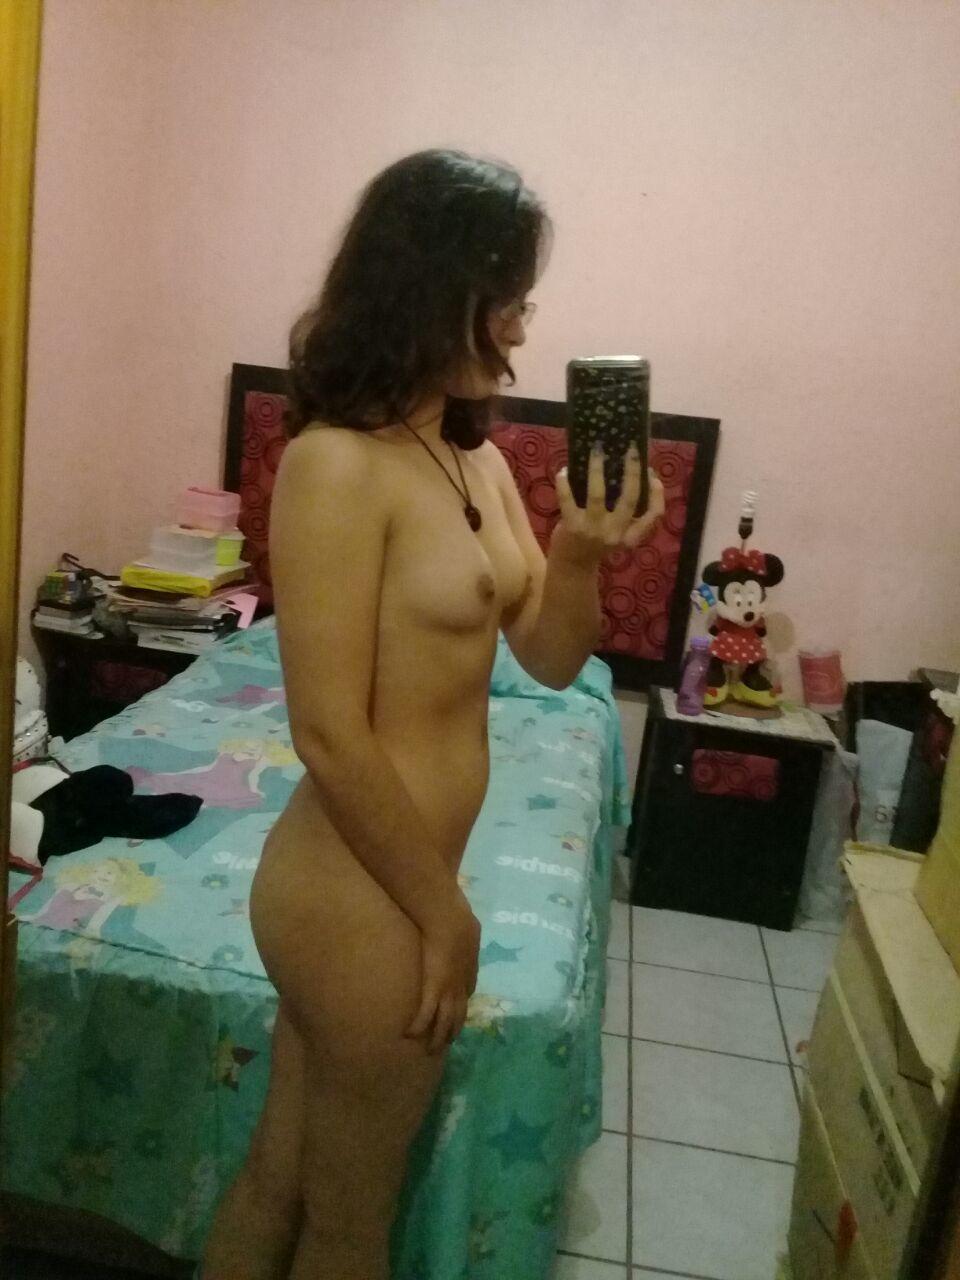 Joven peludita se hace selfies desnuda